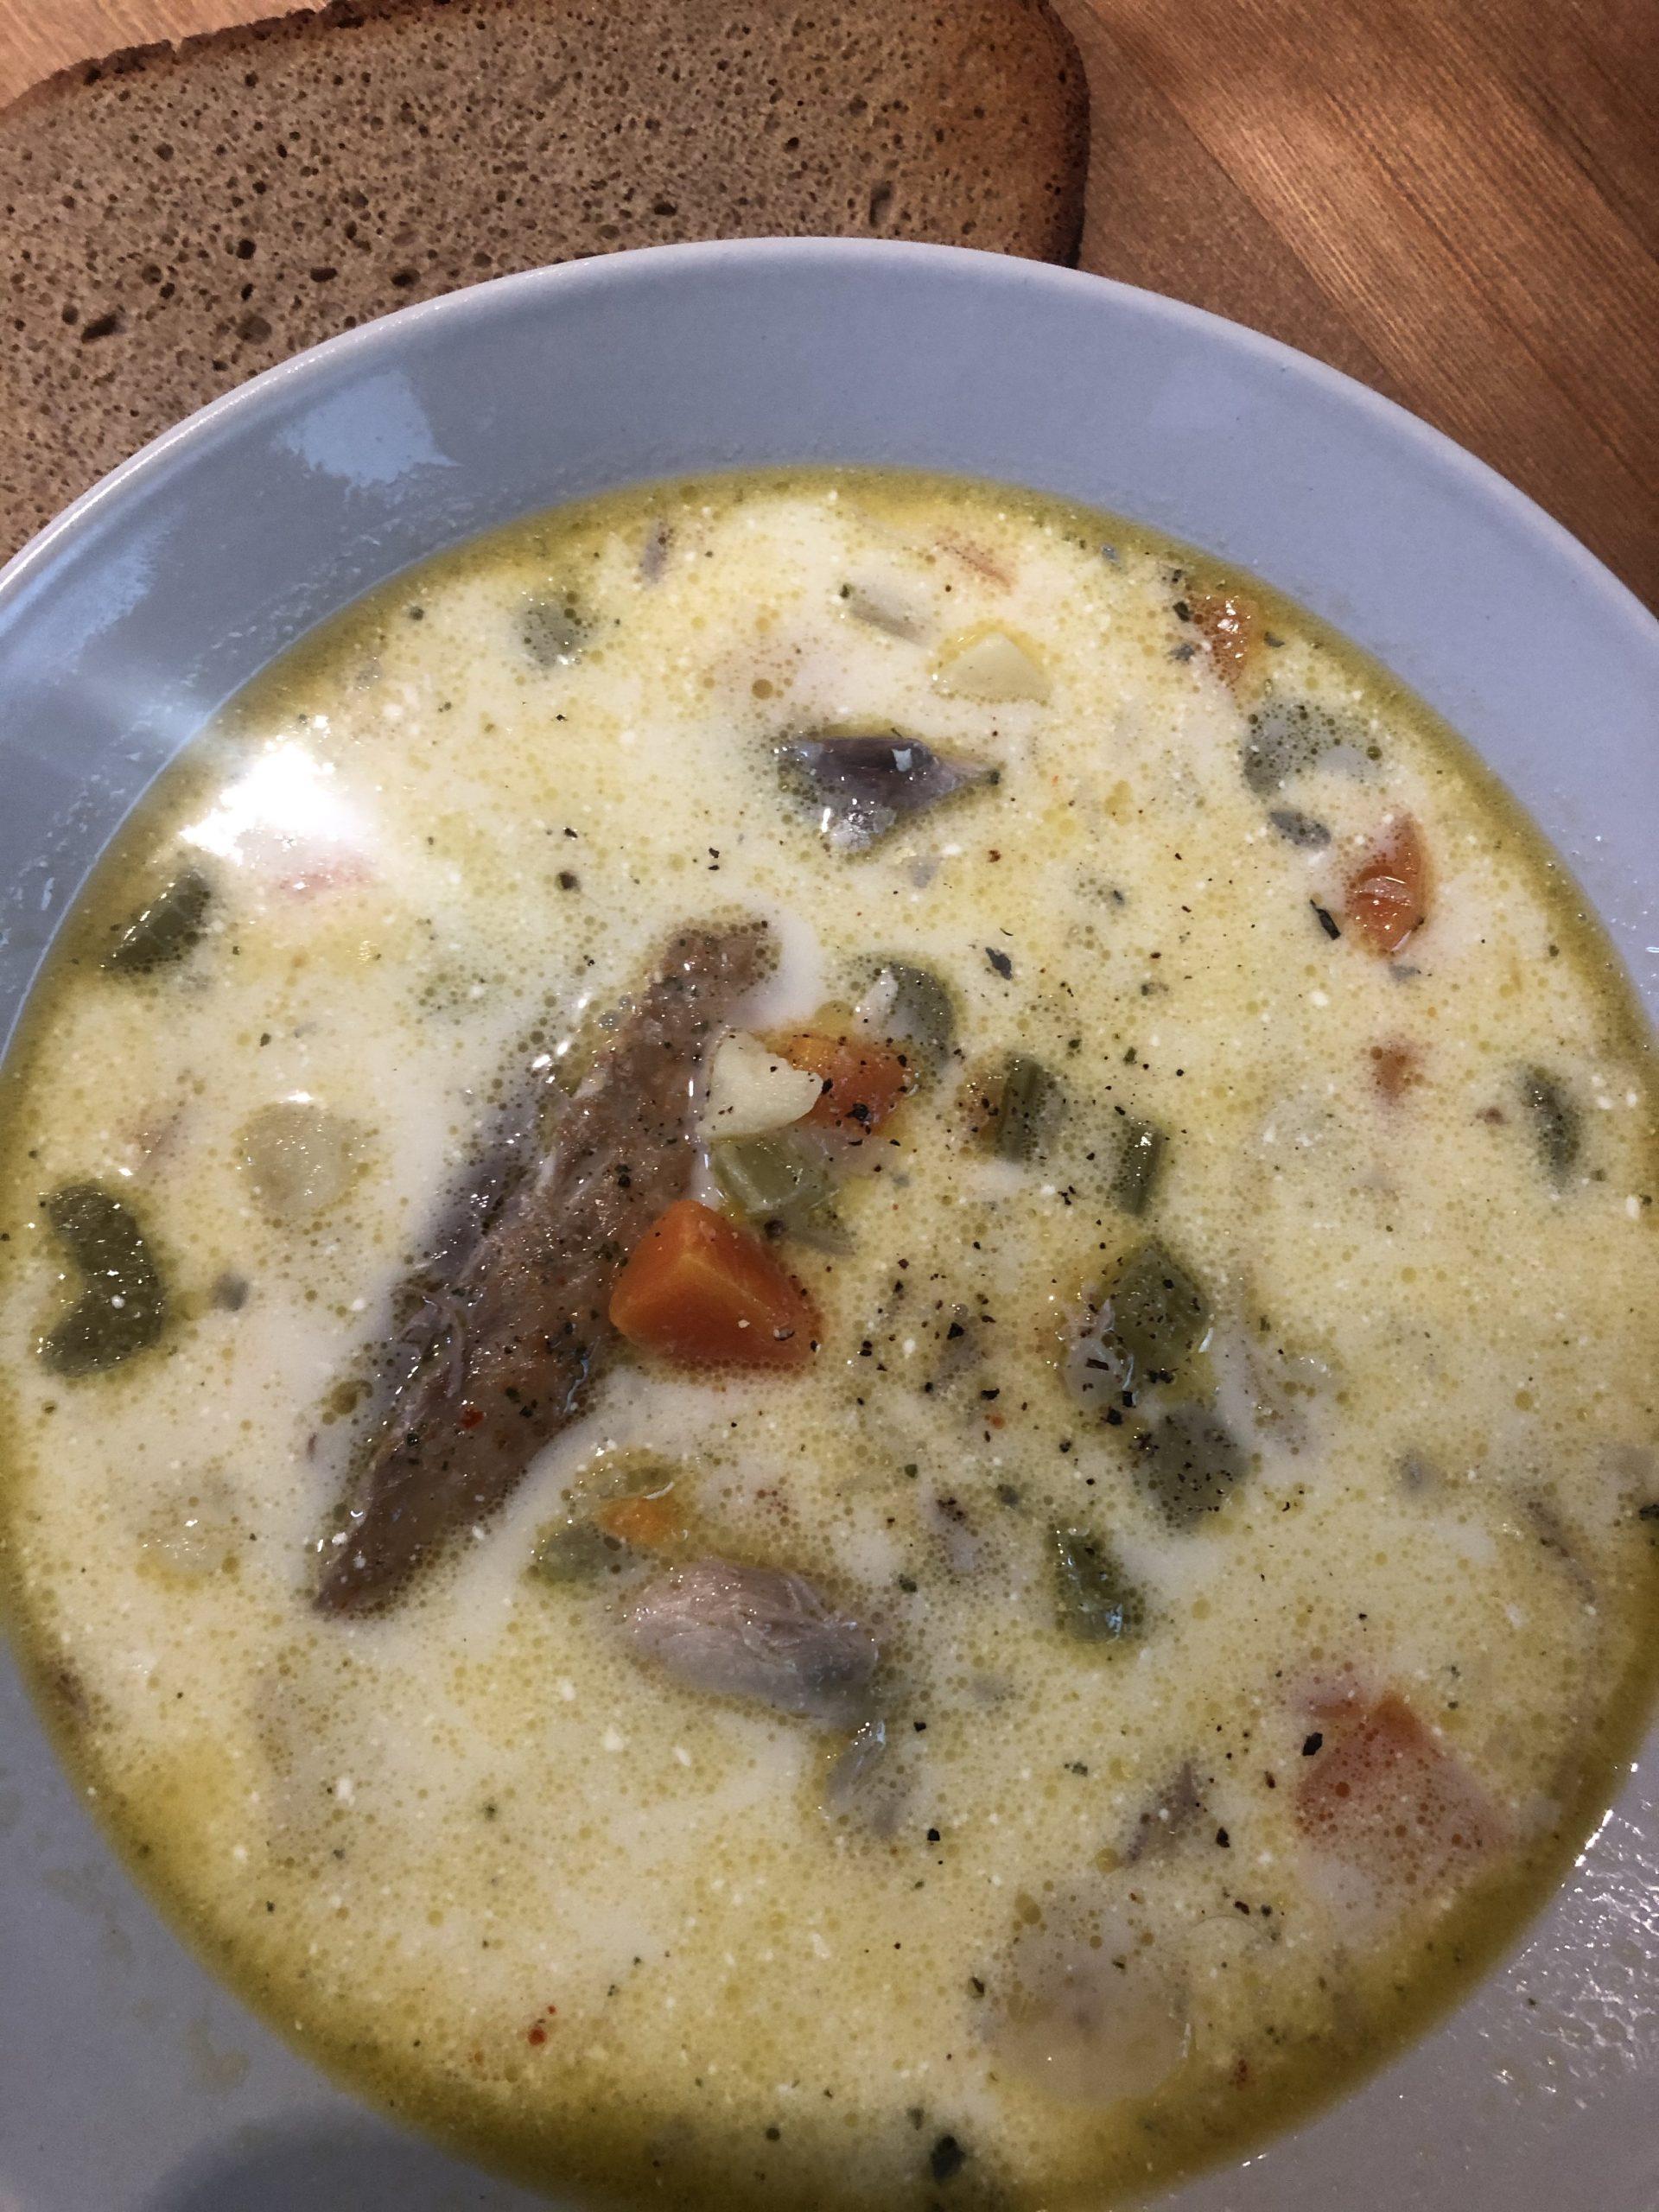 Smoked Mackerel soup recipe with cream